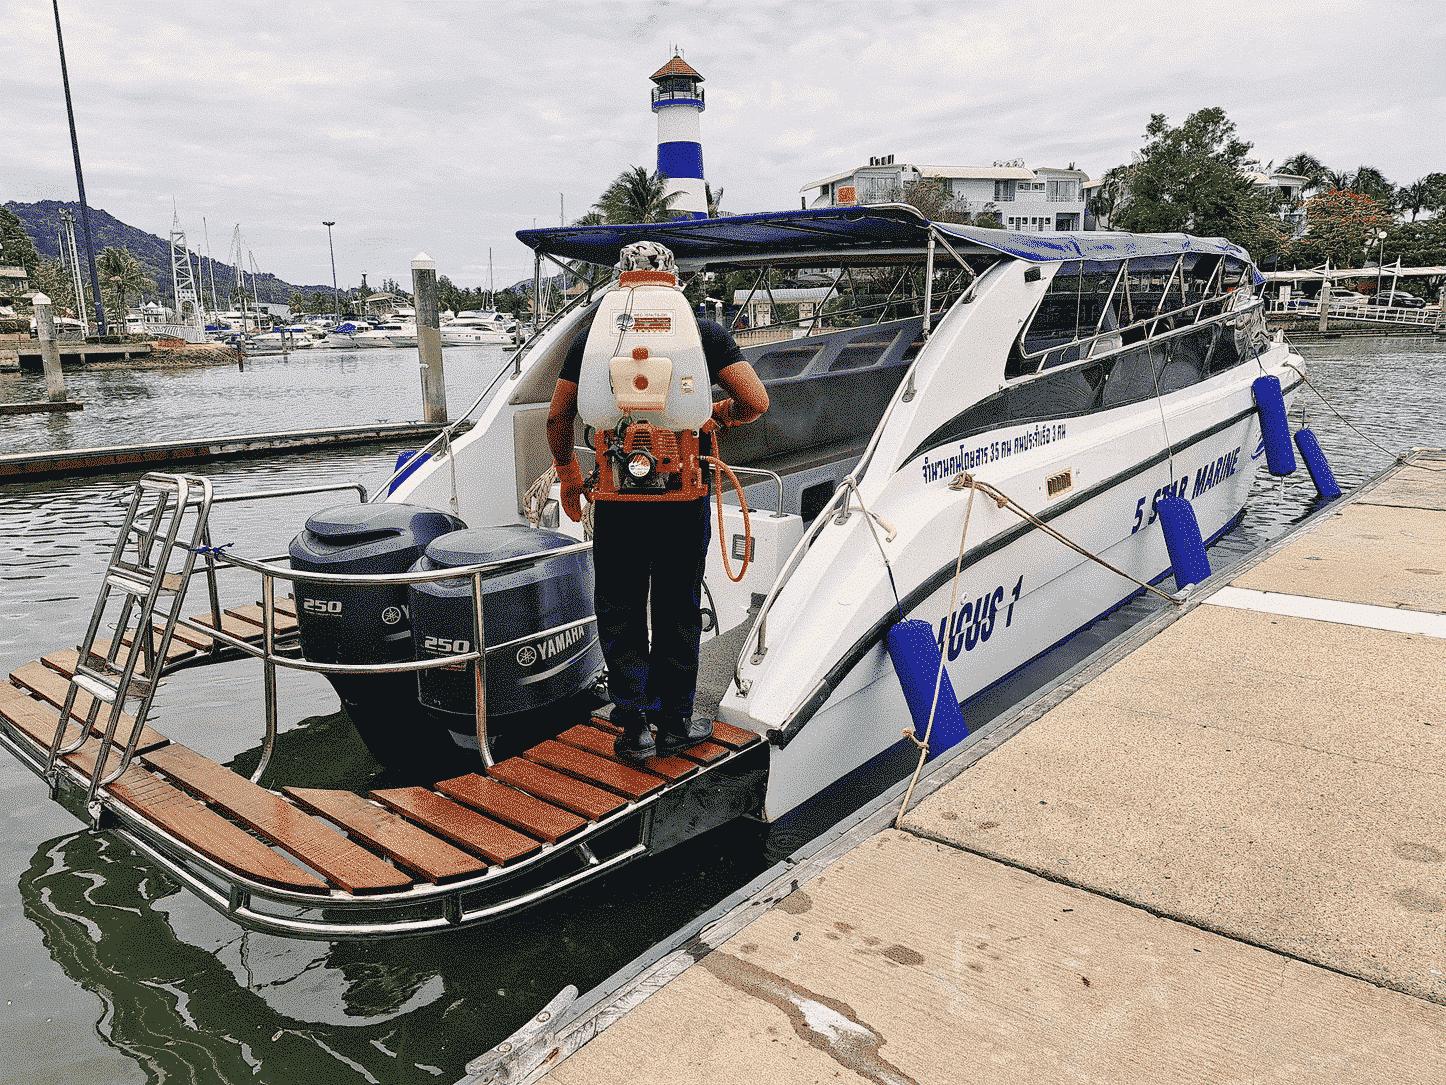 #James Bond Island Private Boat Tour